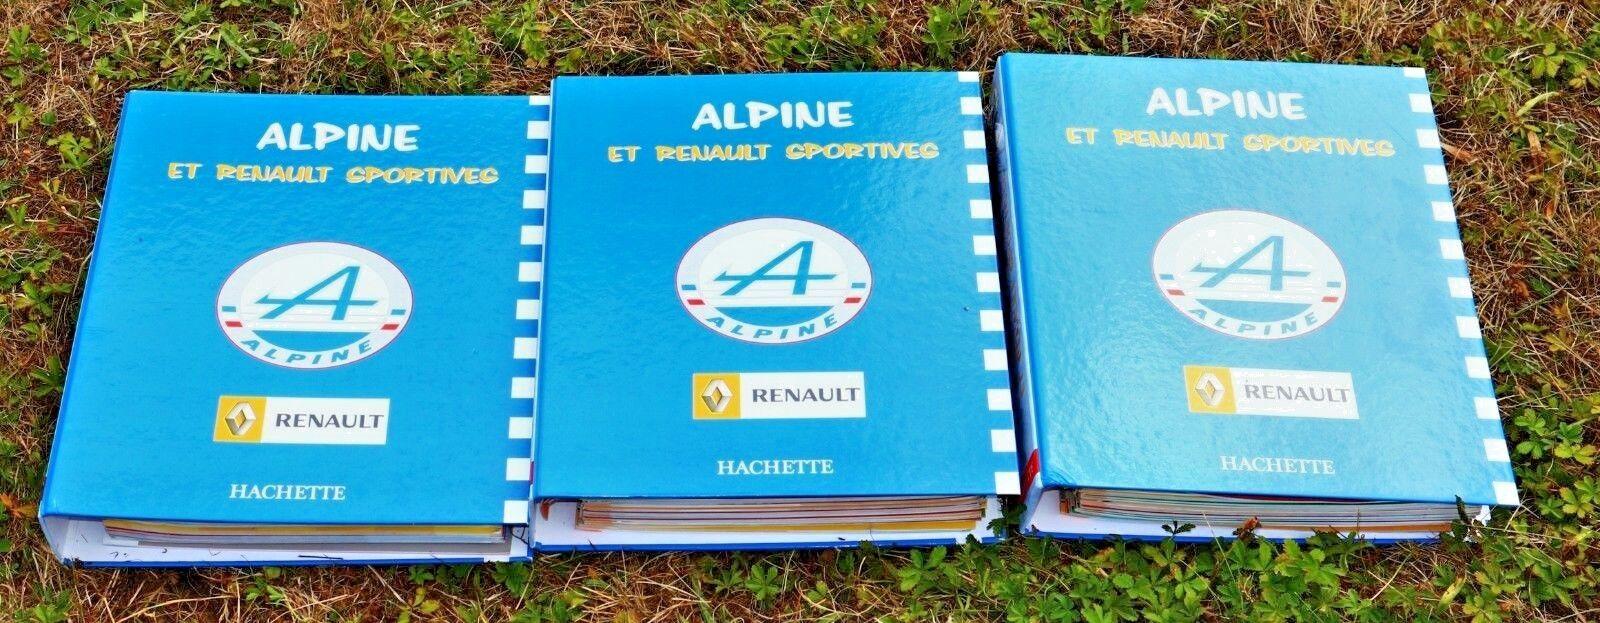 samling hachette 3 klassers complets 65 livrets Alpine et Renault Sports